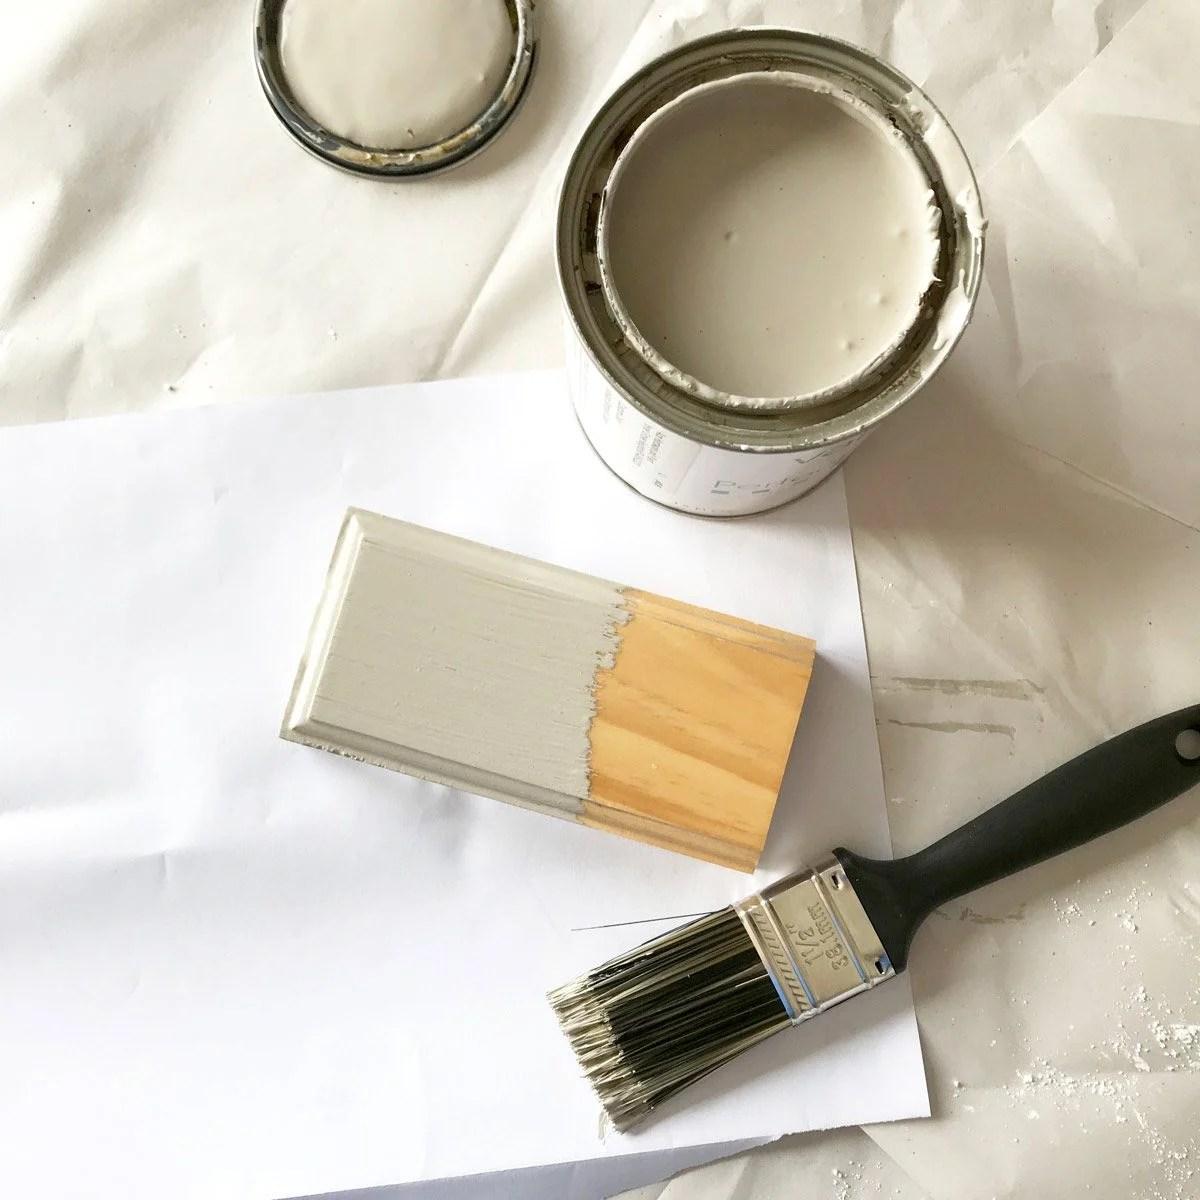 Rustoleum Polyurethane Over Chalk Paint